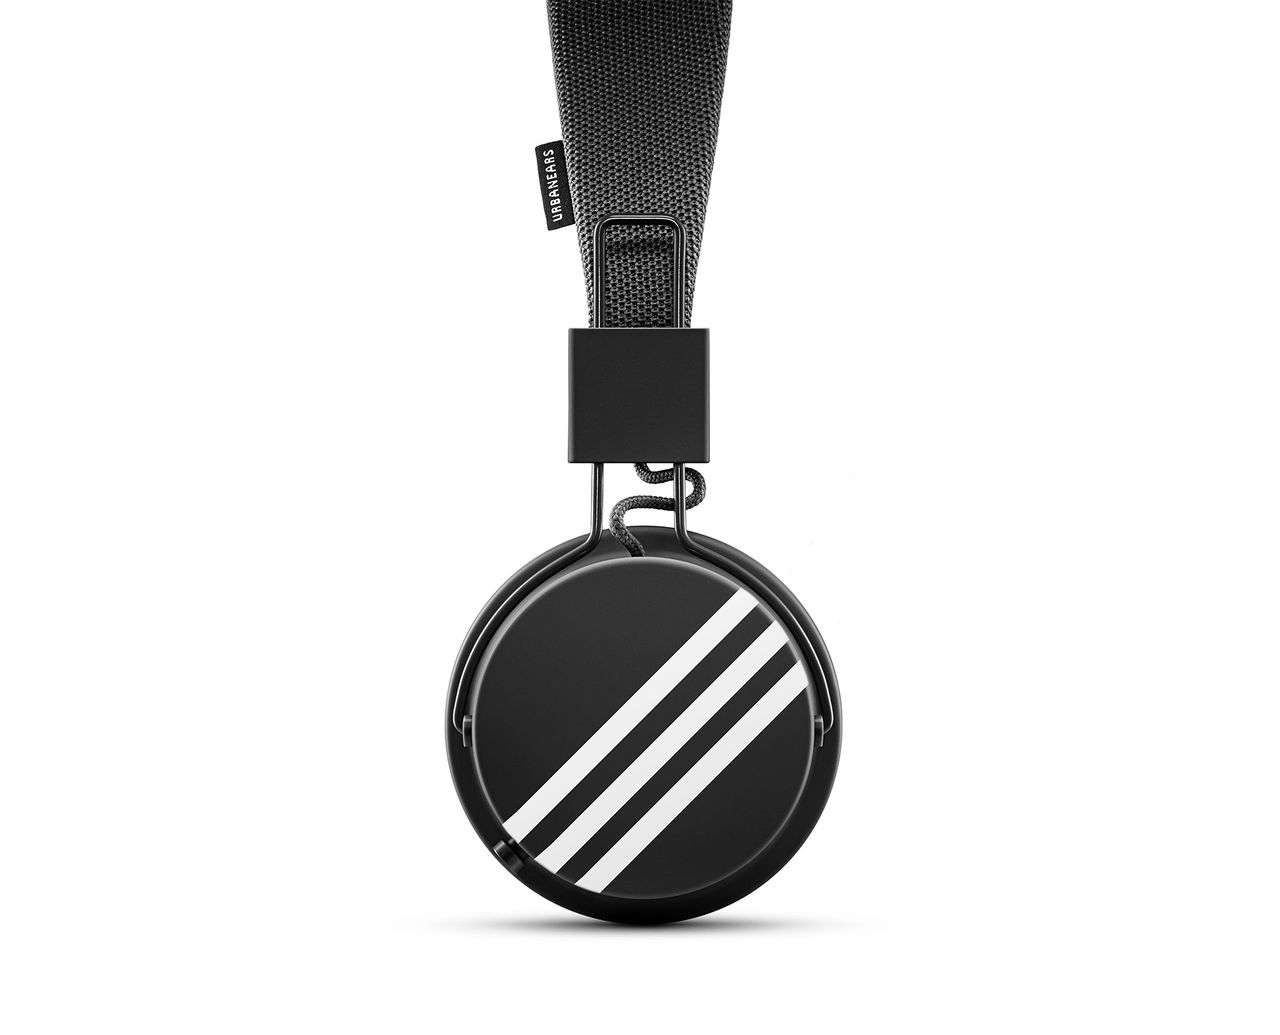 Zound industries ska göra hörlurar åt Adidas